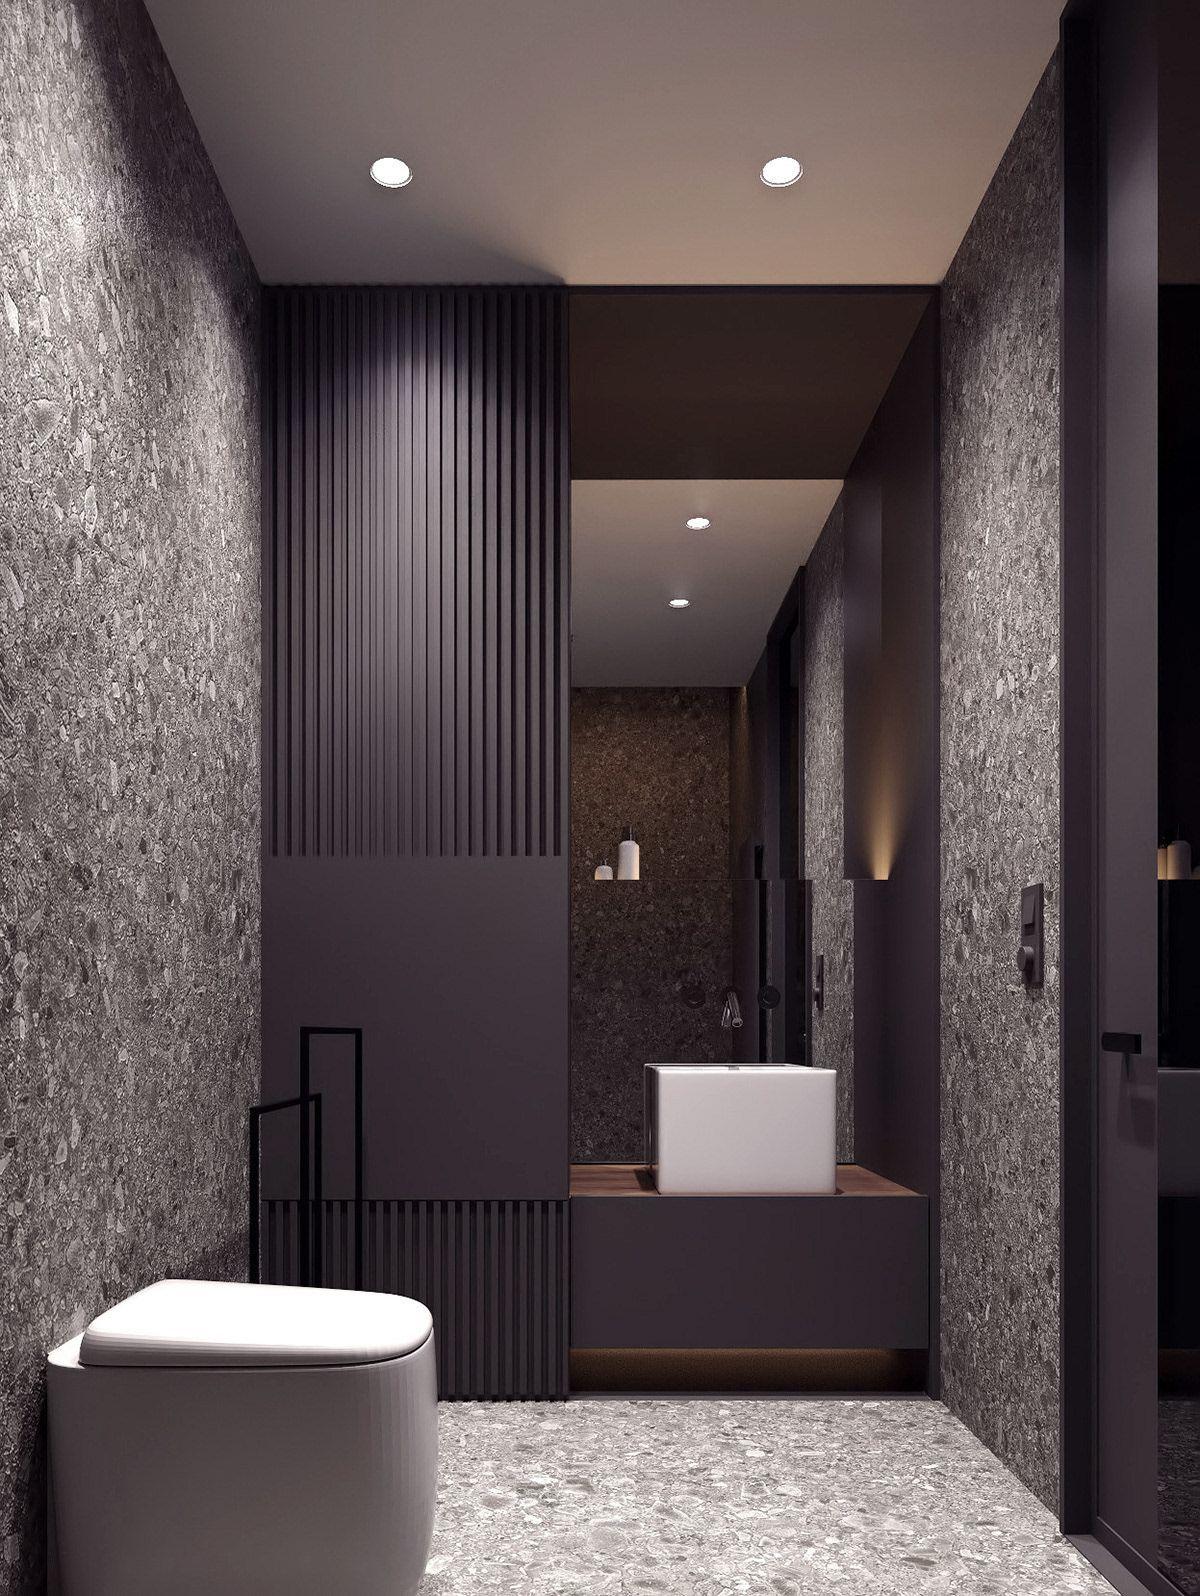 How To Design Bathroom Interiors With Personality Roskoshnye